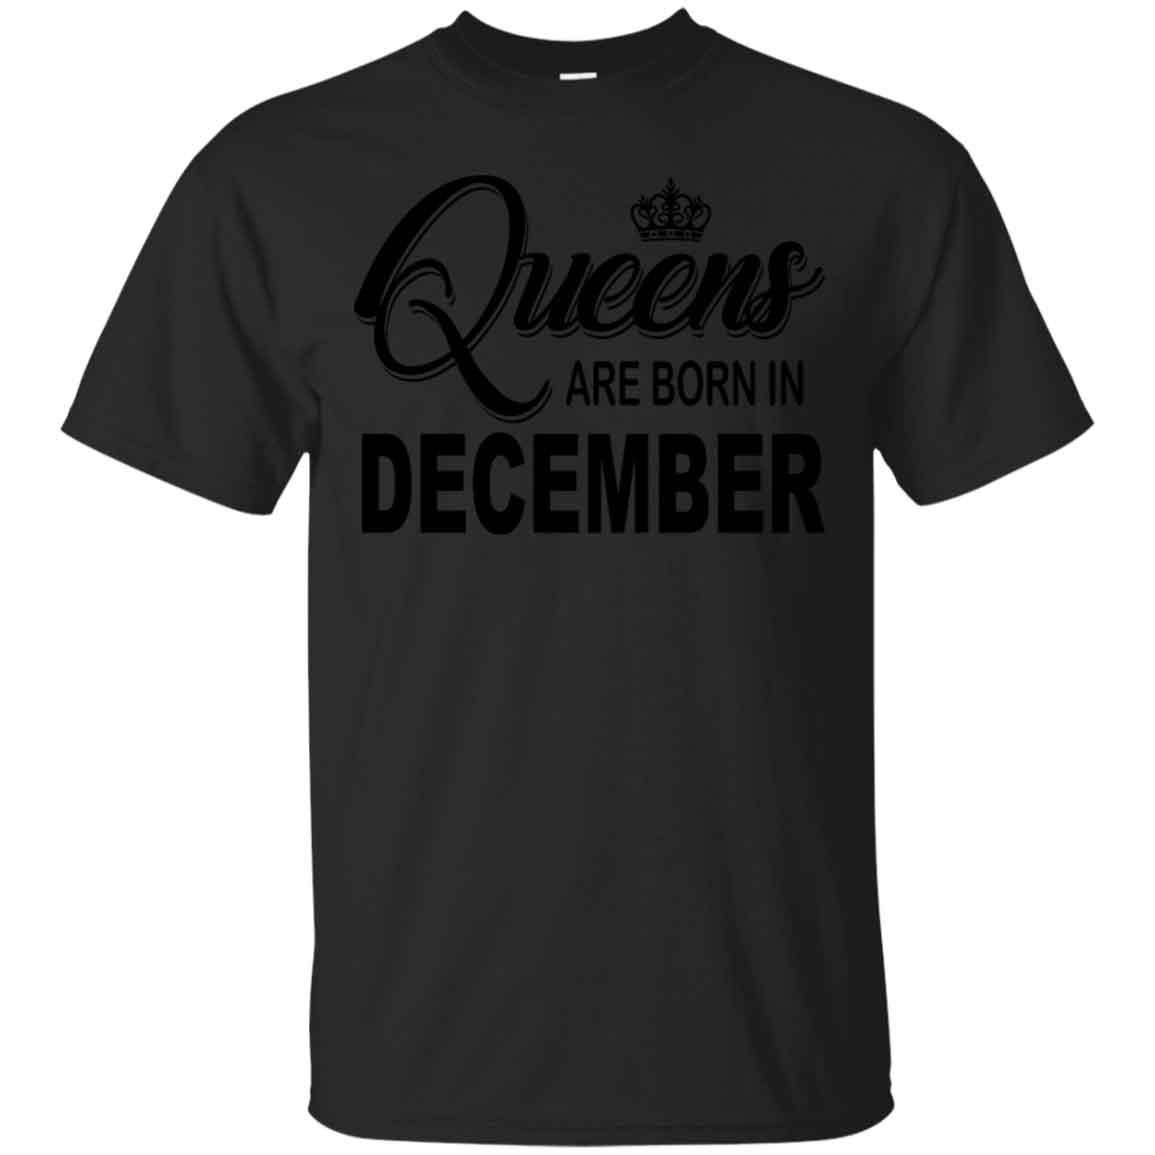 6bae431c6 Birthday Queens Are Born In December (3) Hoodies Sweatshirts – TeeTrio